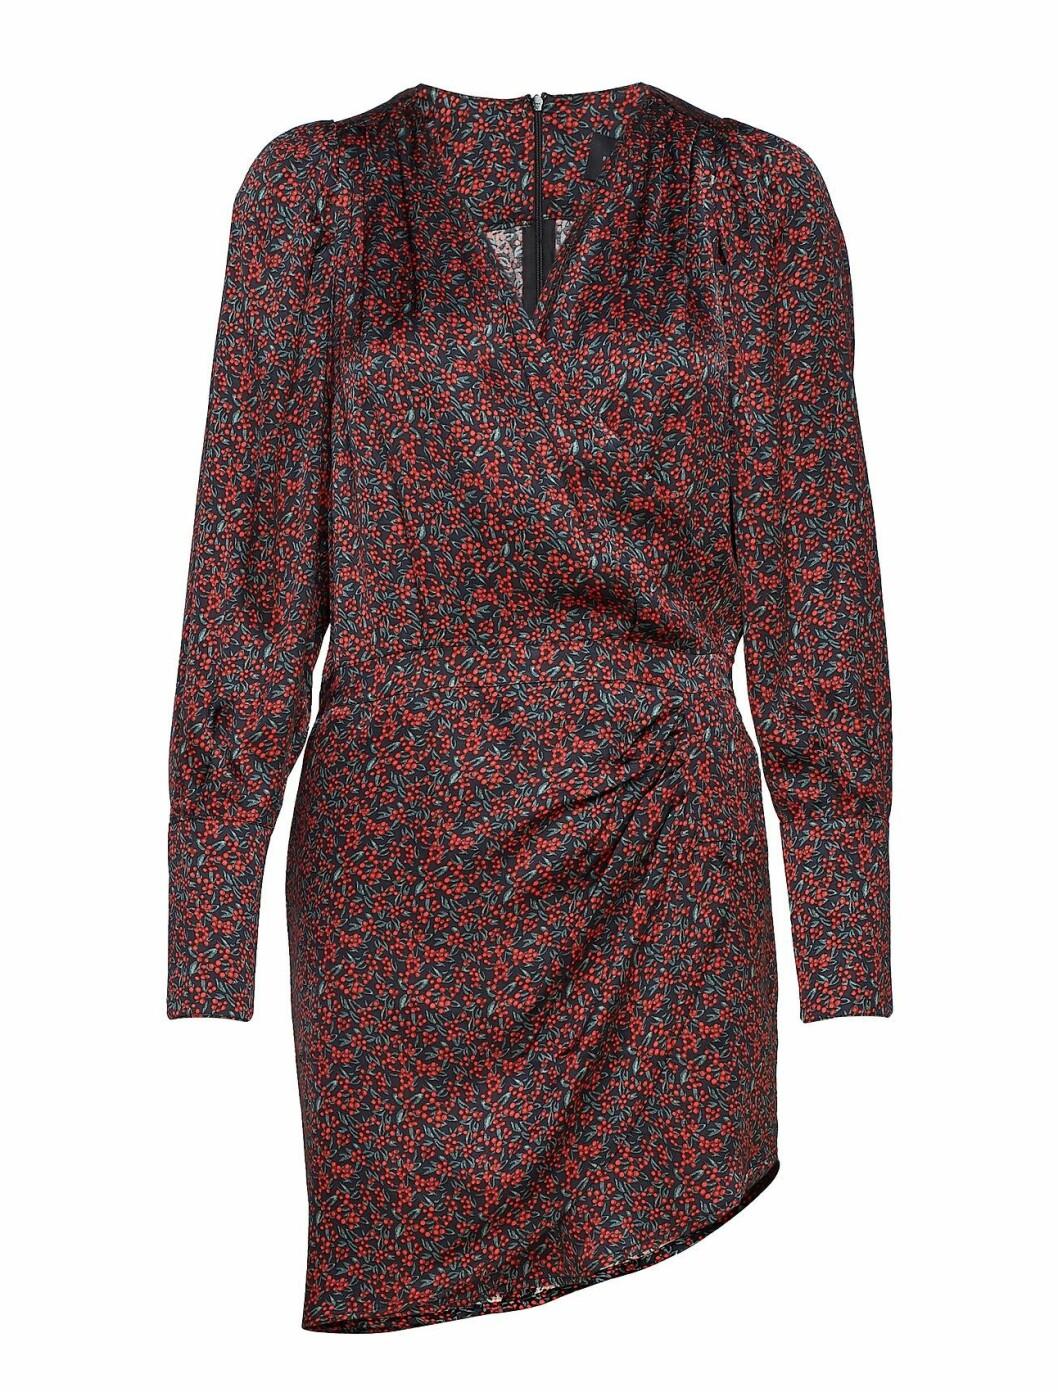 Kjole fra Birgitte Herskind |2099,-| https://www.boozt.com/no/no/birgitte-herskind/cheri-dress_19437452/19437454?path=67362&navId=67362&sNavId=67378&group=listing&position=1000000